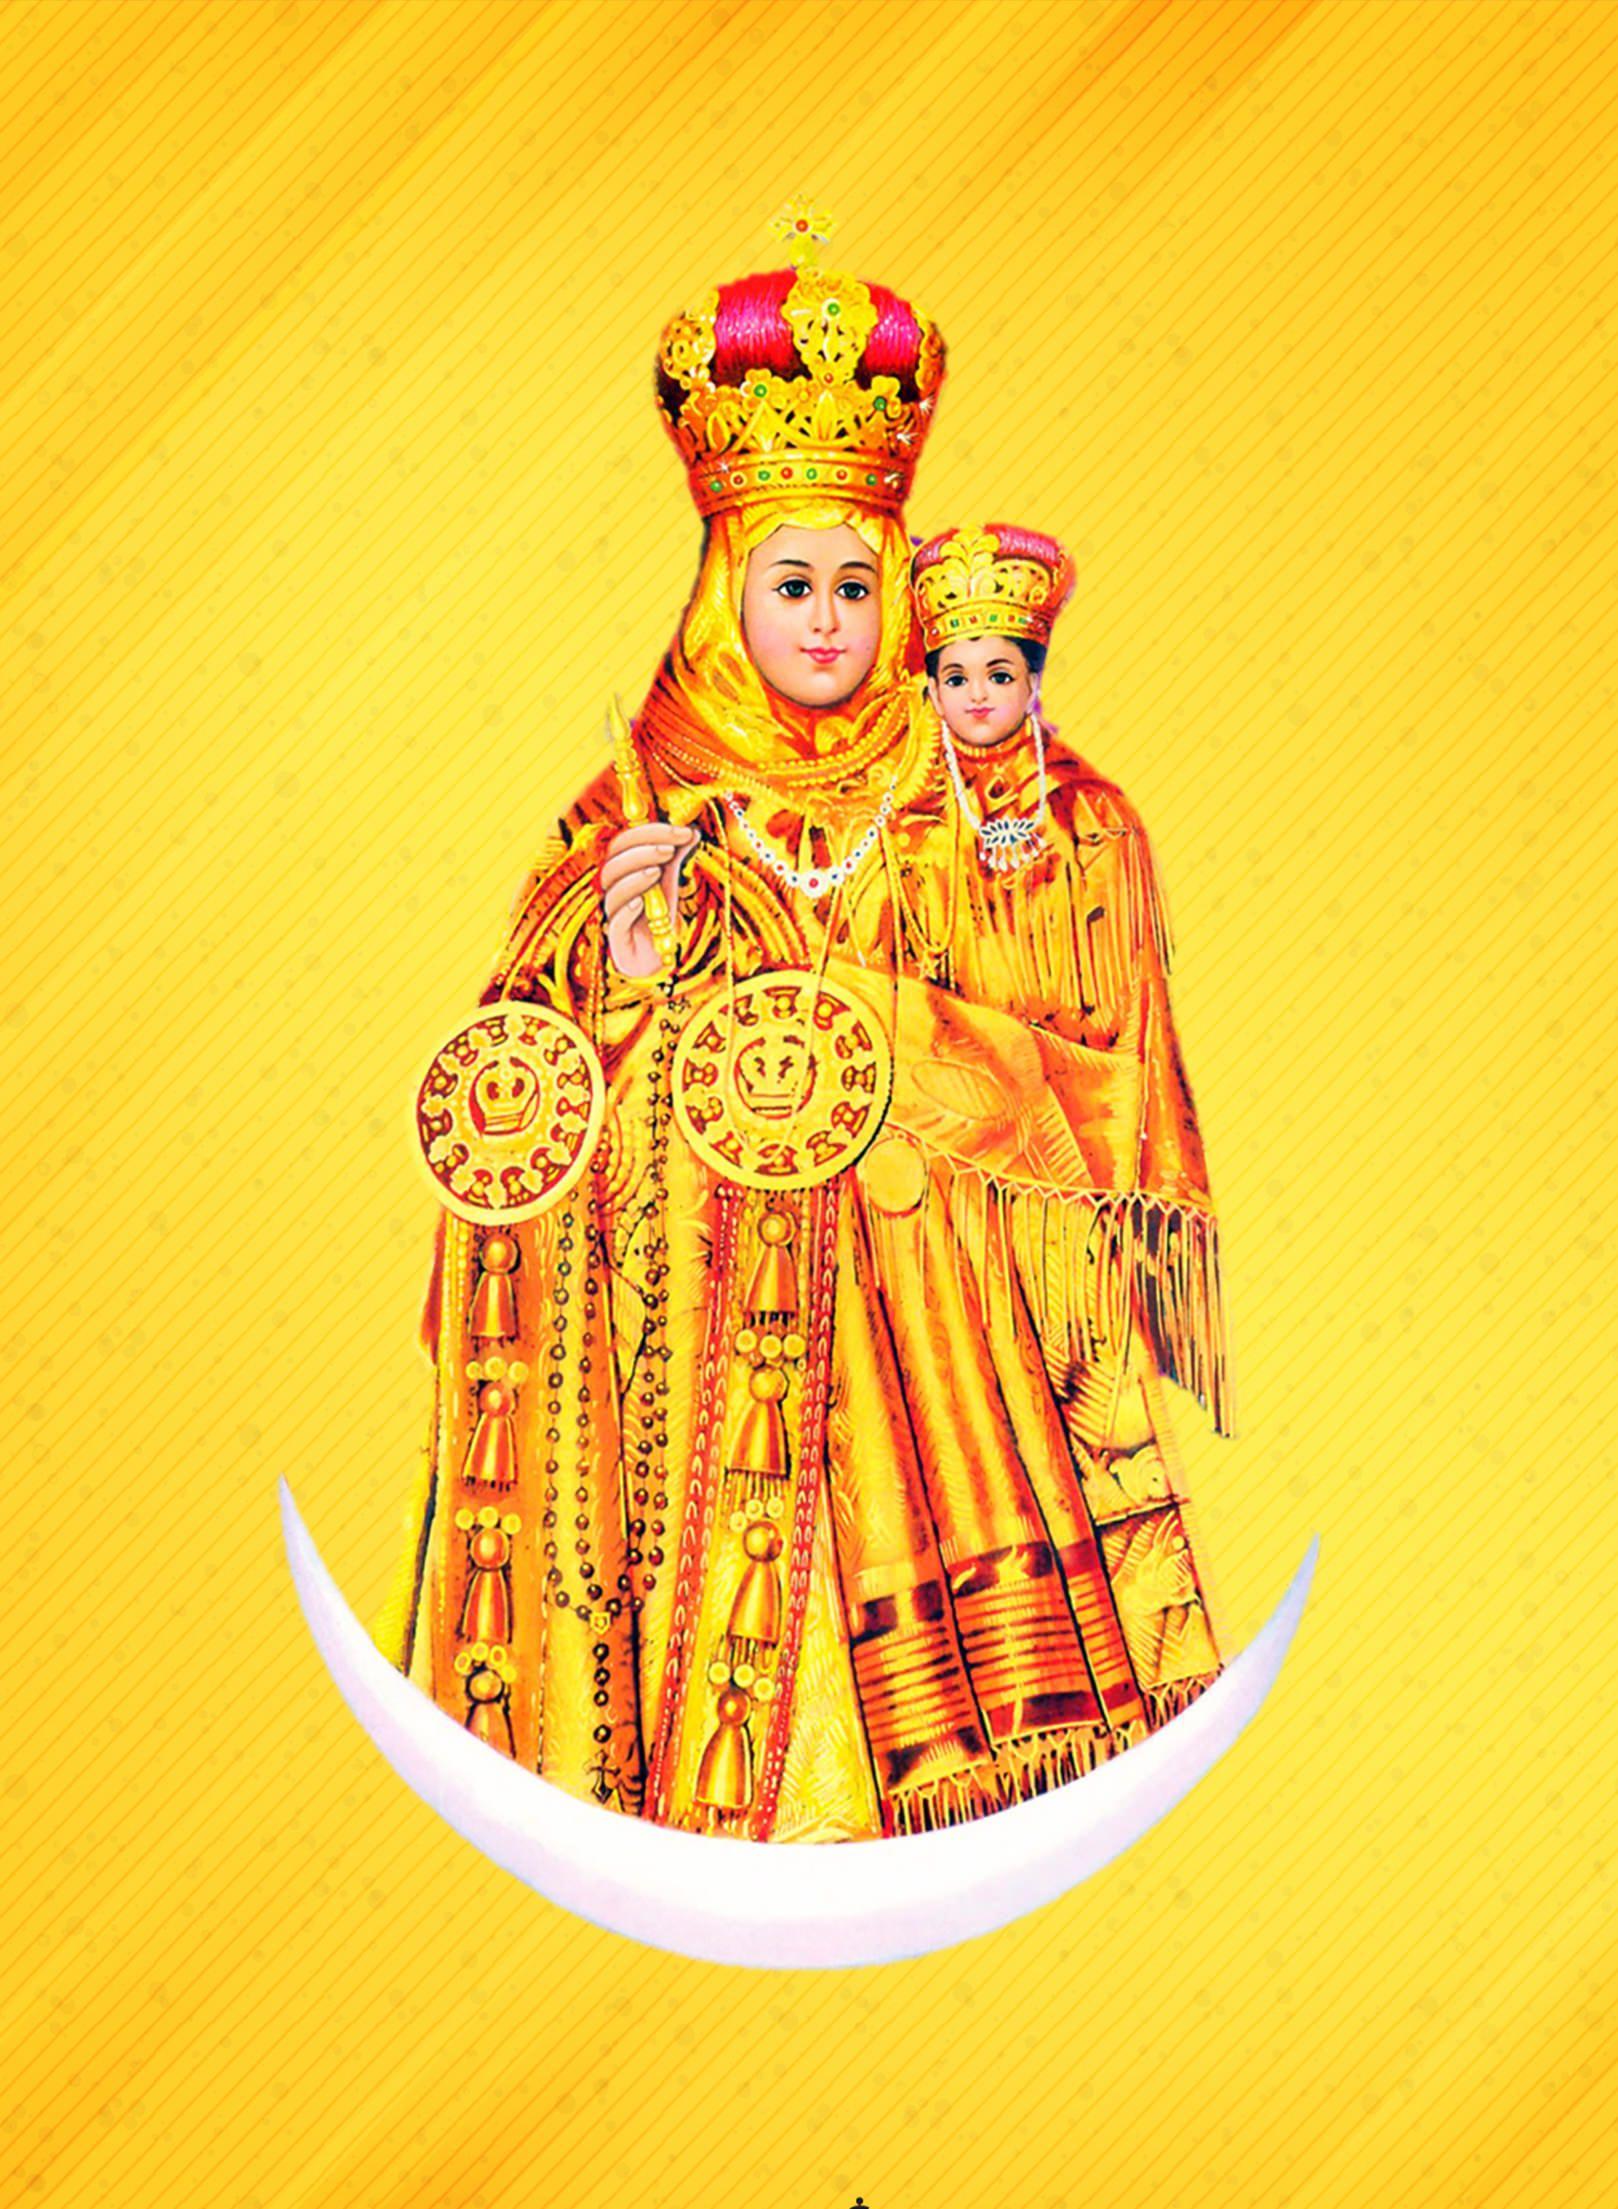 Our Lady of Good Health, Annai Velankanni Madha Mother